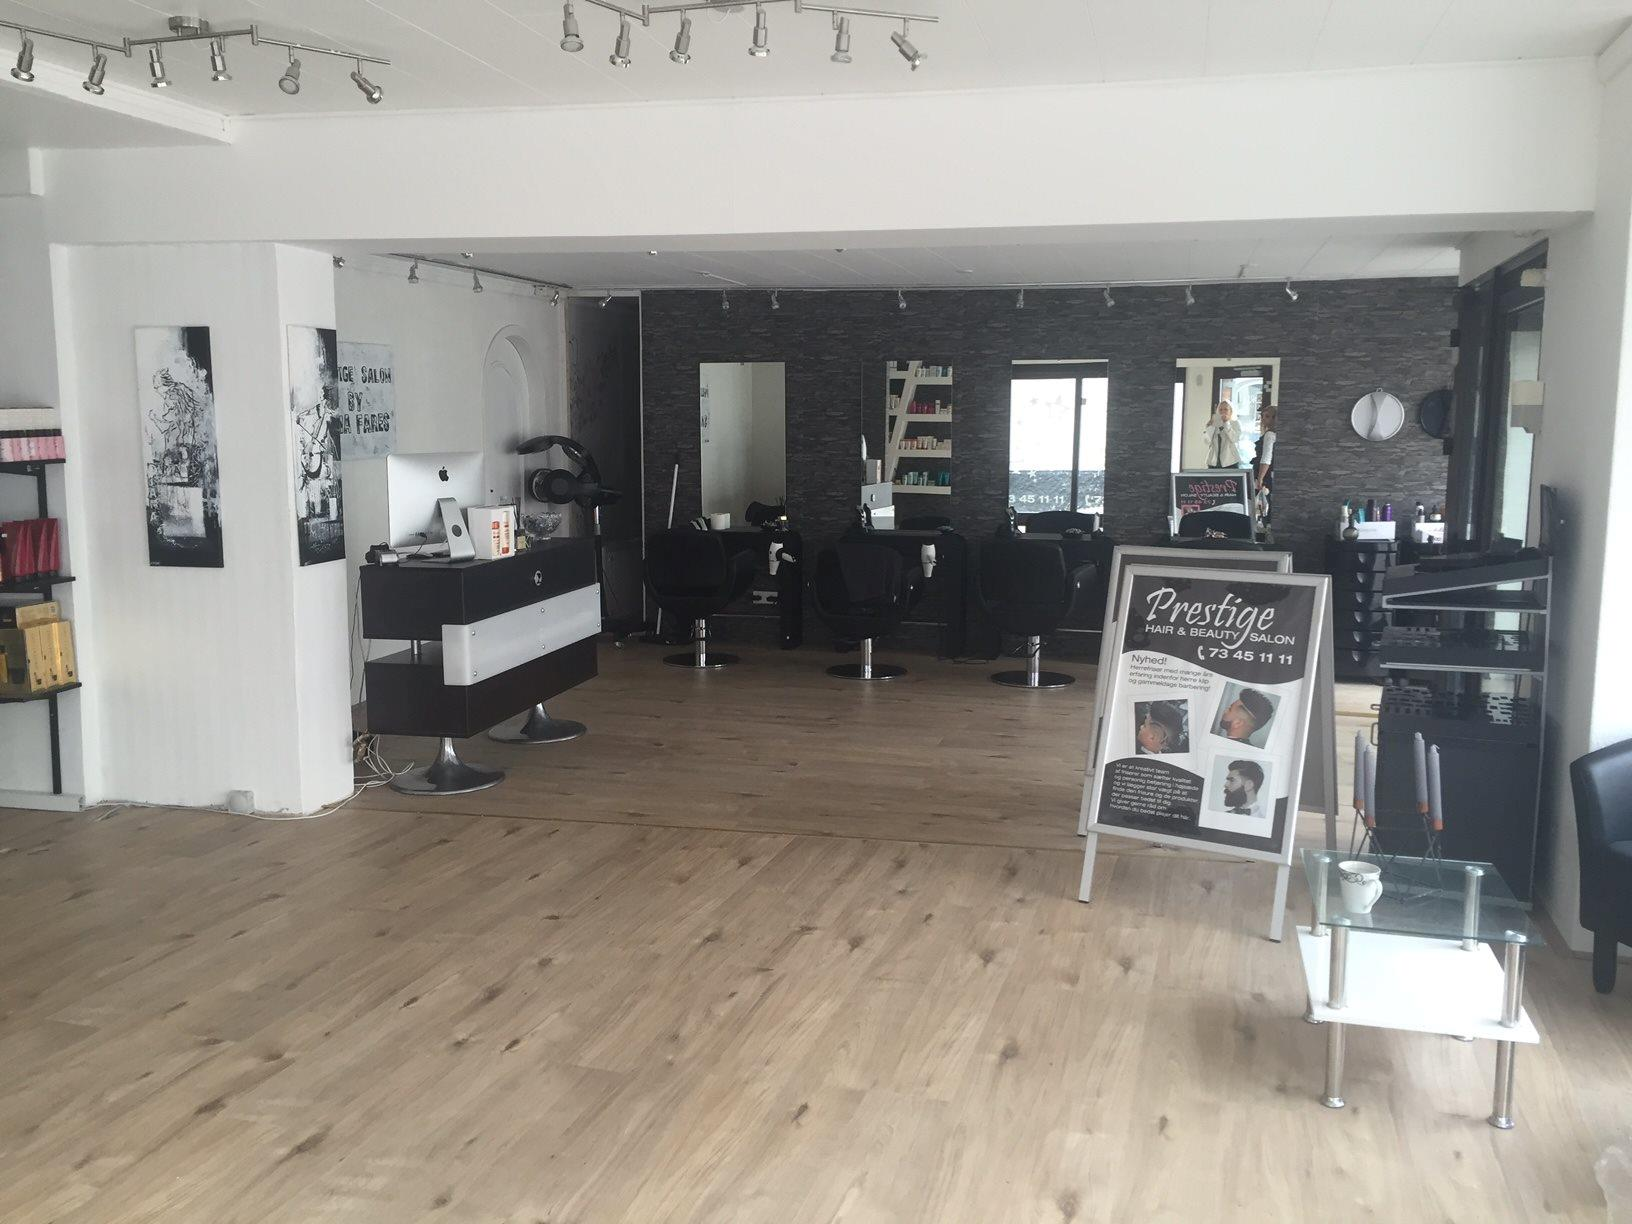 Bolig/erhverv på Perlegade i Sønderborg - Salon